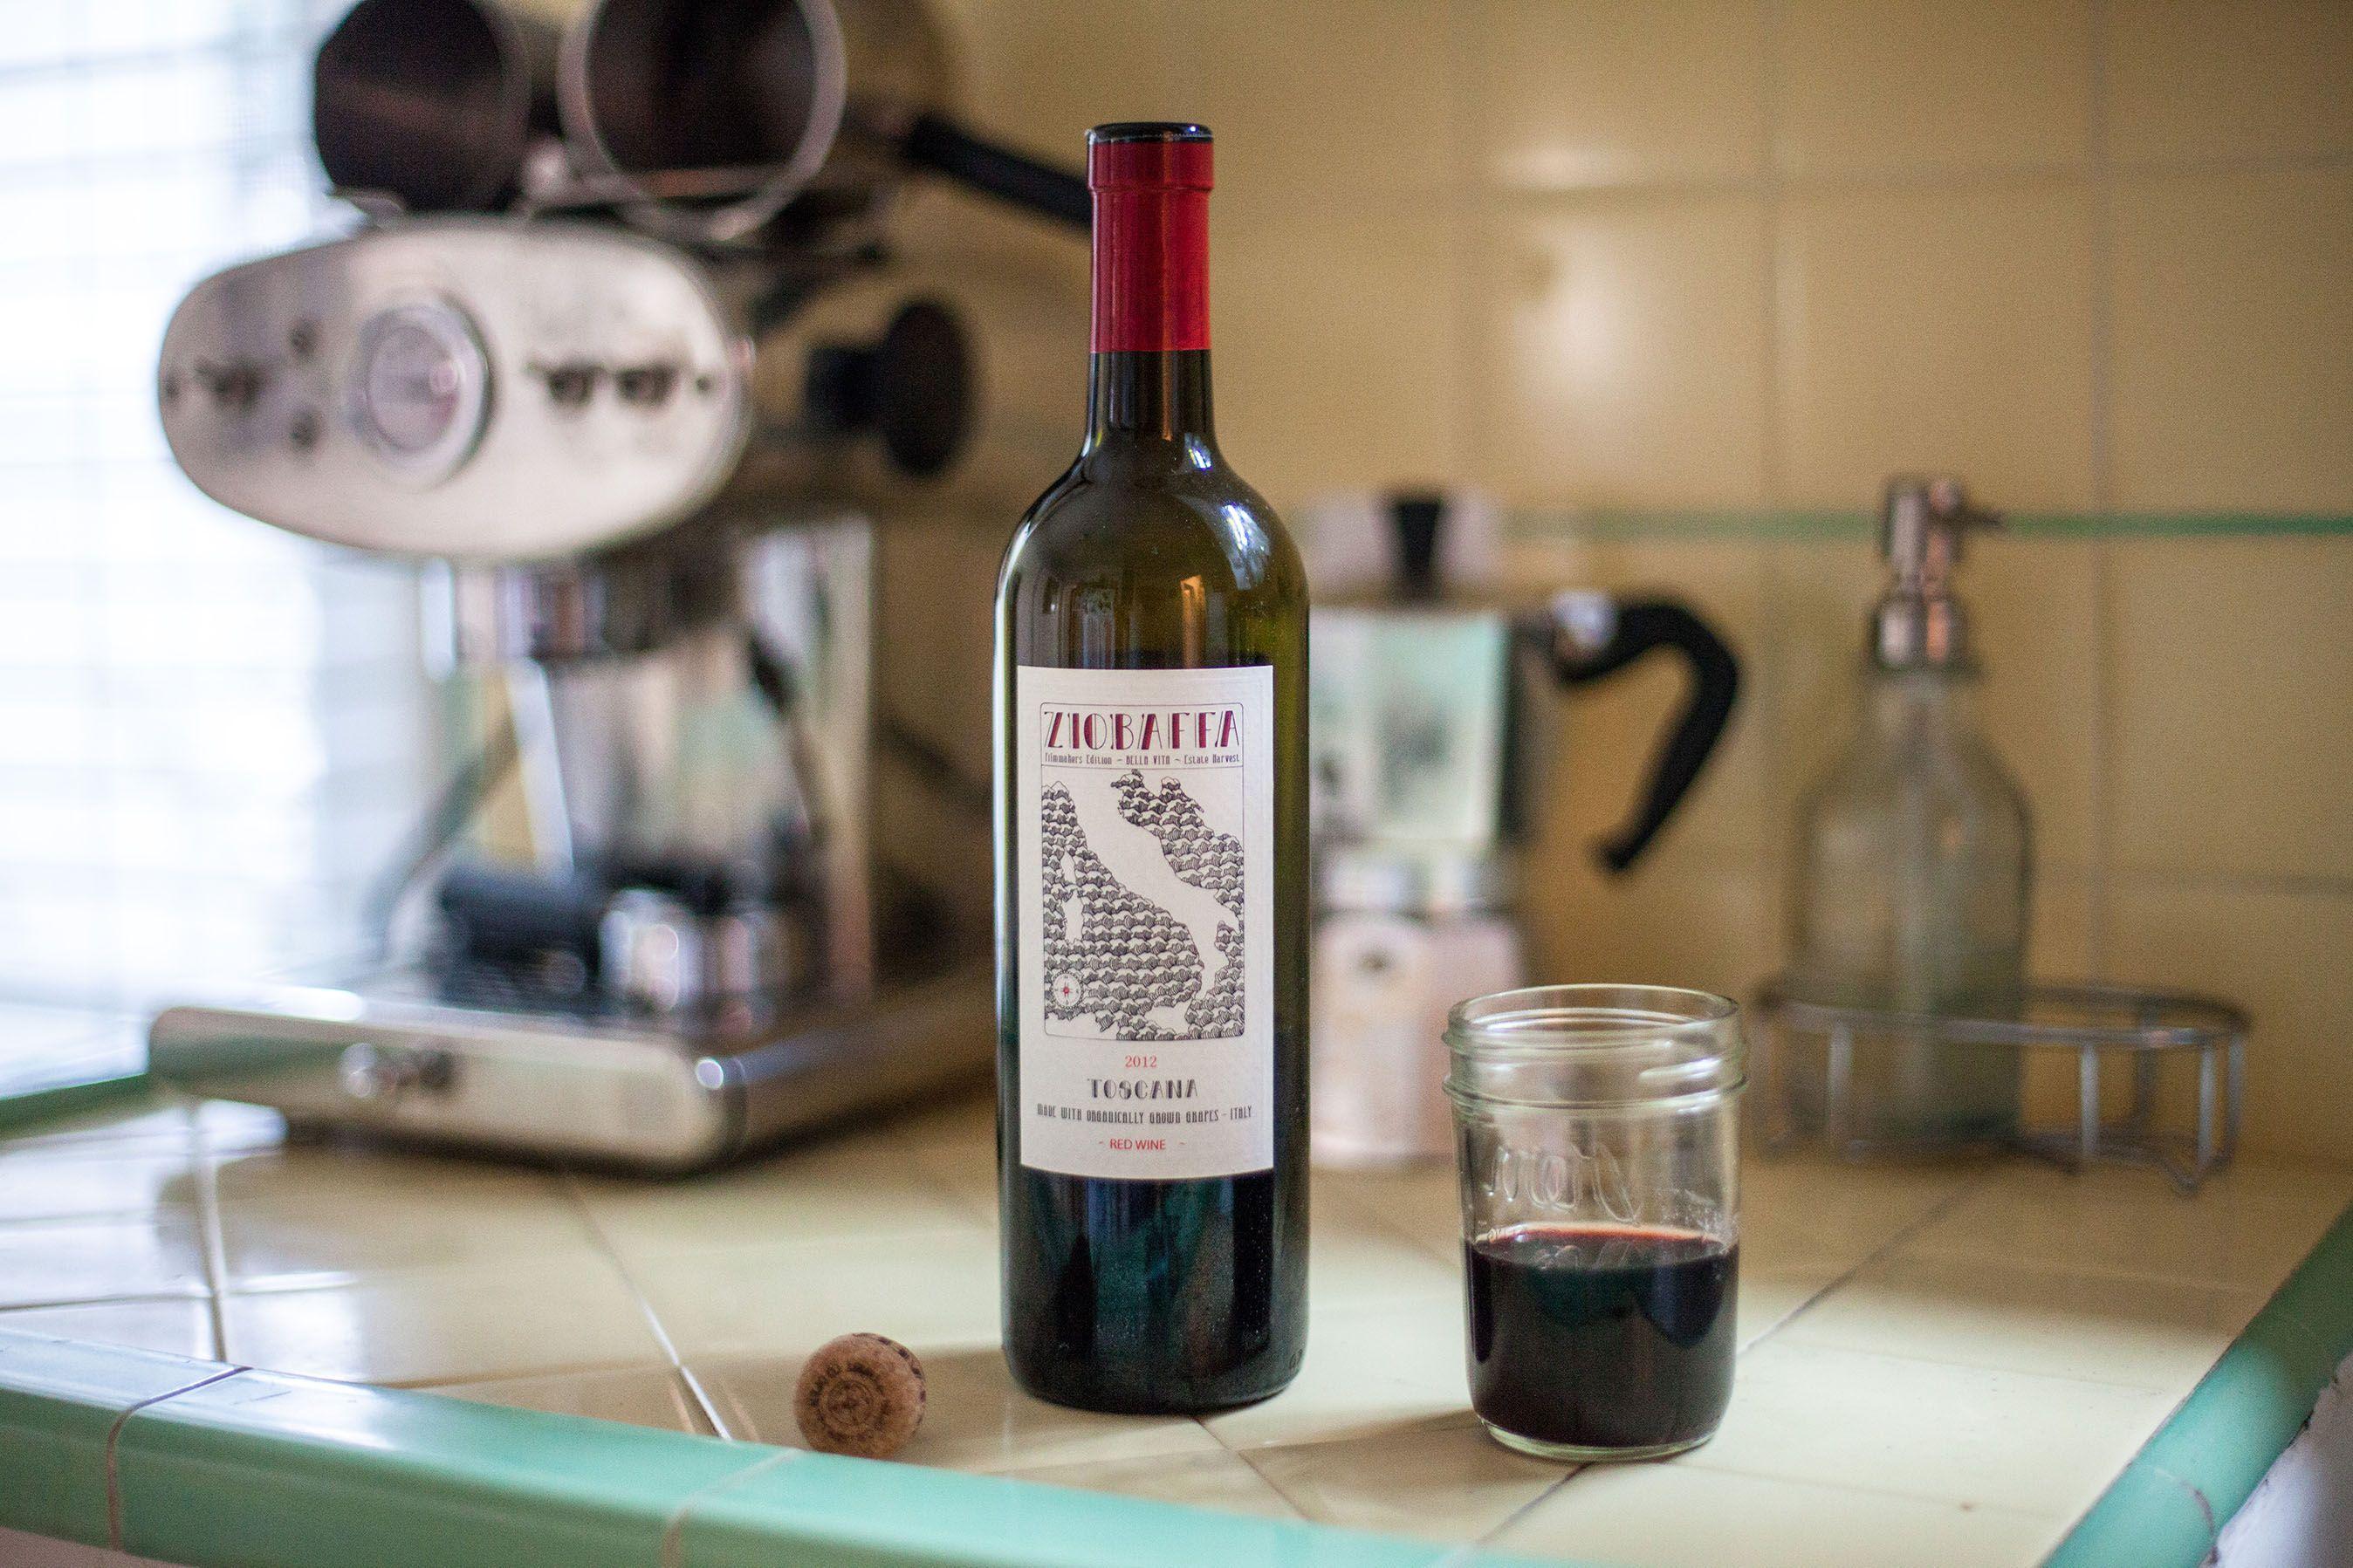 Wine is life...Discover ZIOBAFFA organic Italian wine, sustainably produced in a waste zero facilty. http://www.ziobaffa.com/toscana-rosso  Get updates everyday from ZIO social community .  #LIVELIFEBEAUTIFULLY #organicwine #redwine #winelovers #vegan